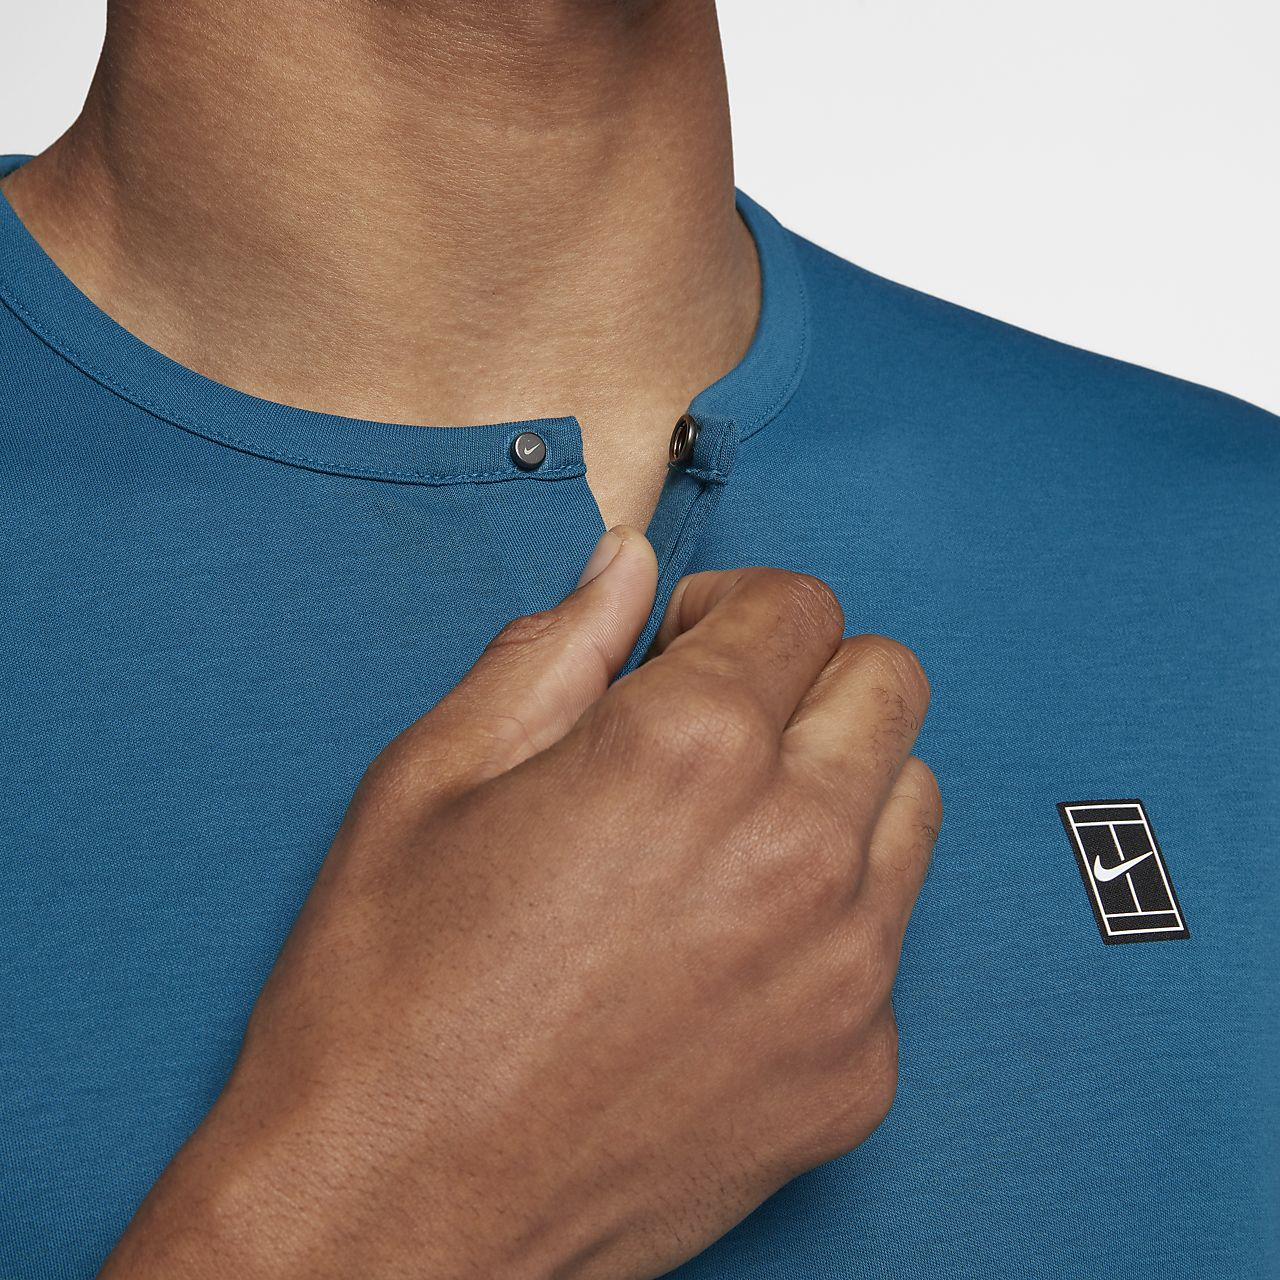 c47caf70 NikeCourt Men's Short-Sleeve Tennis Top. Nike.com CH